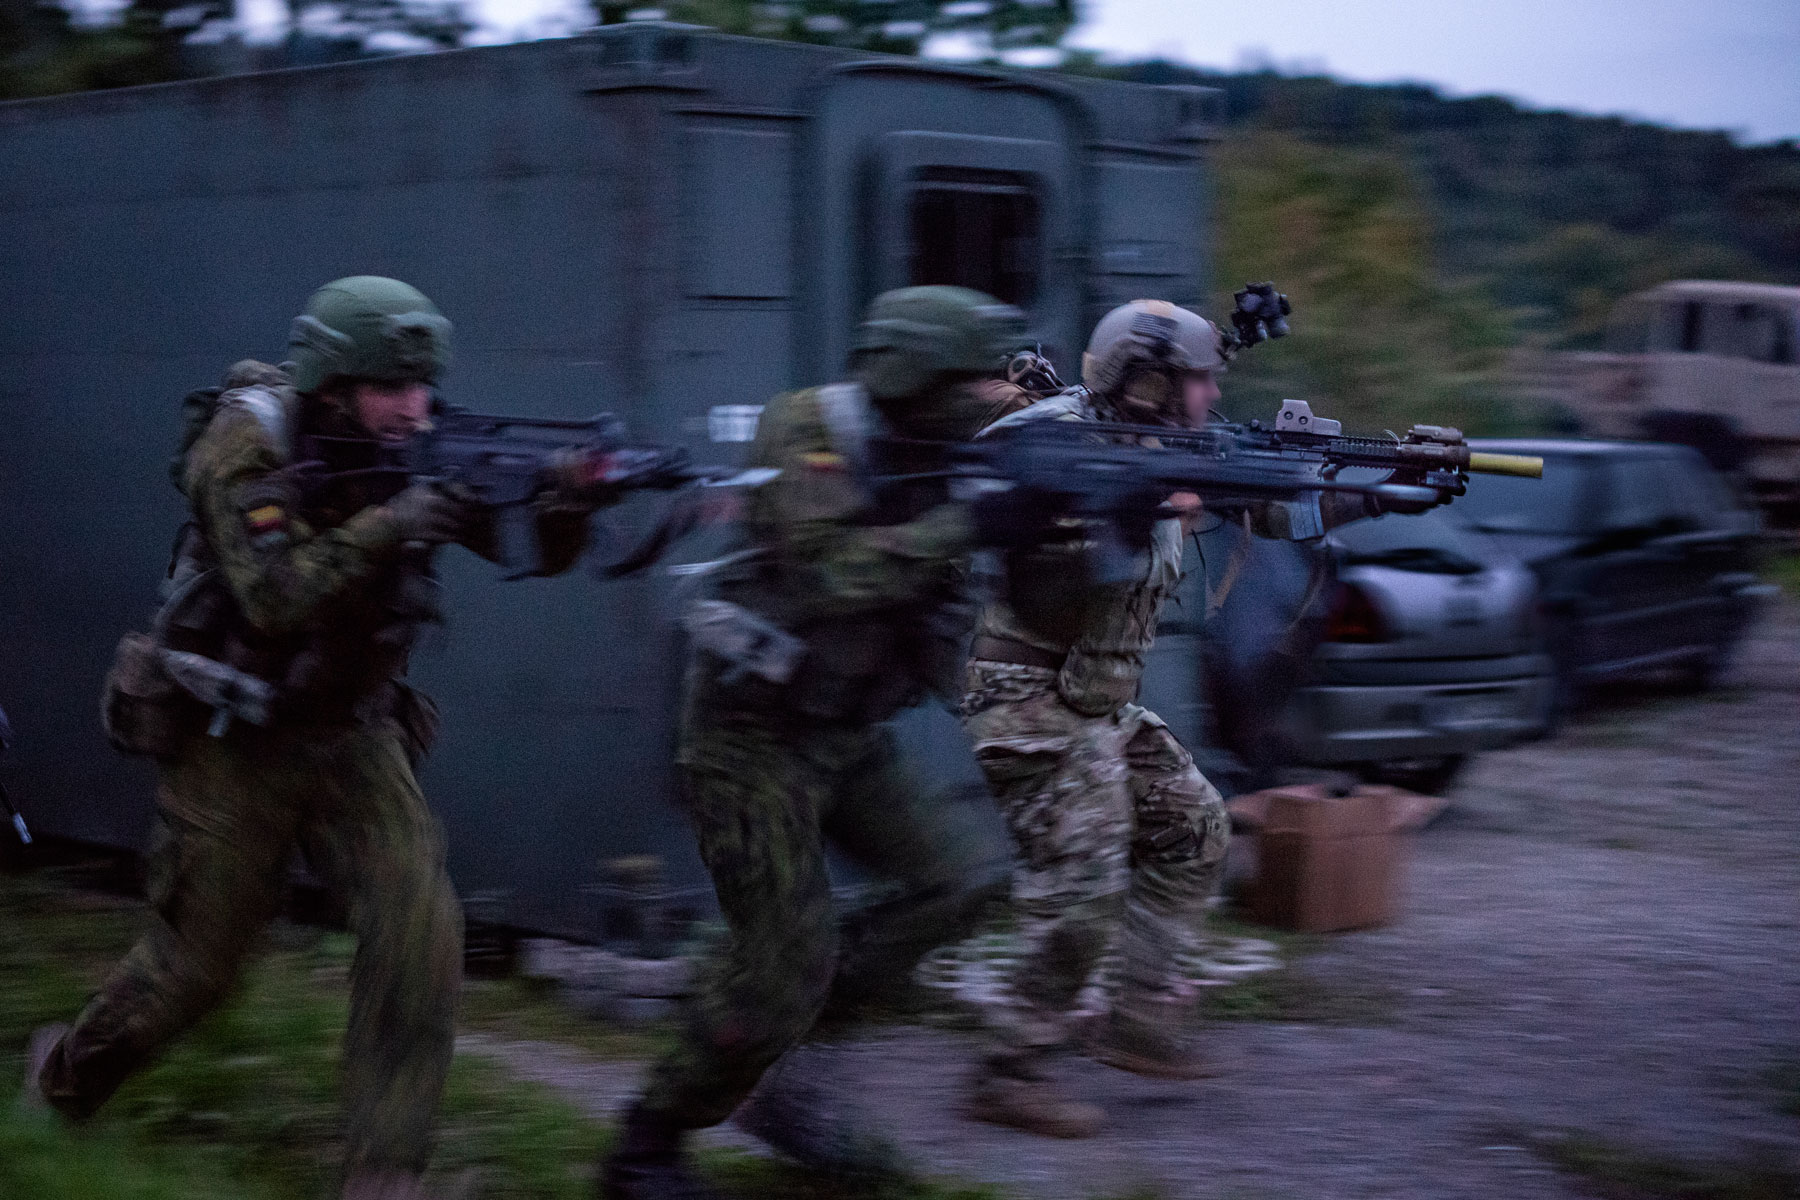 dod officials  irregular warfare  information ops key to